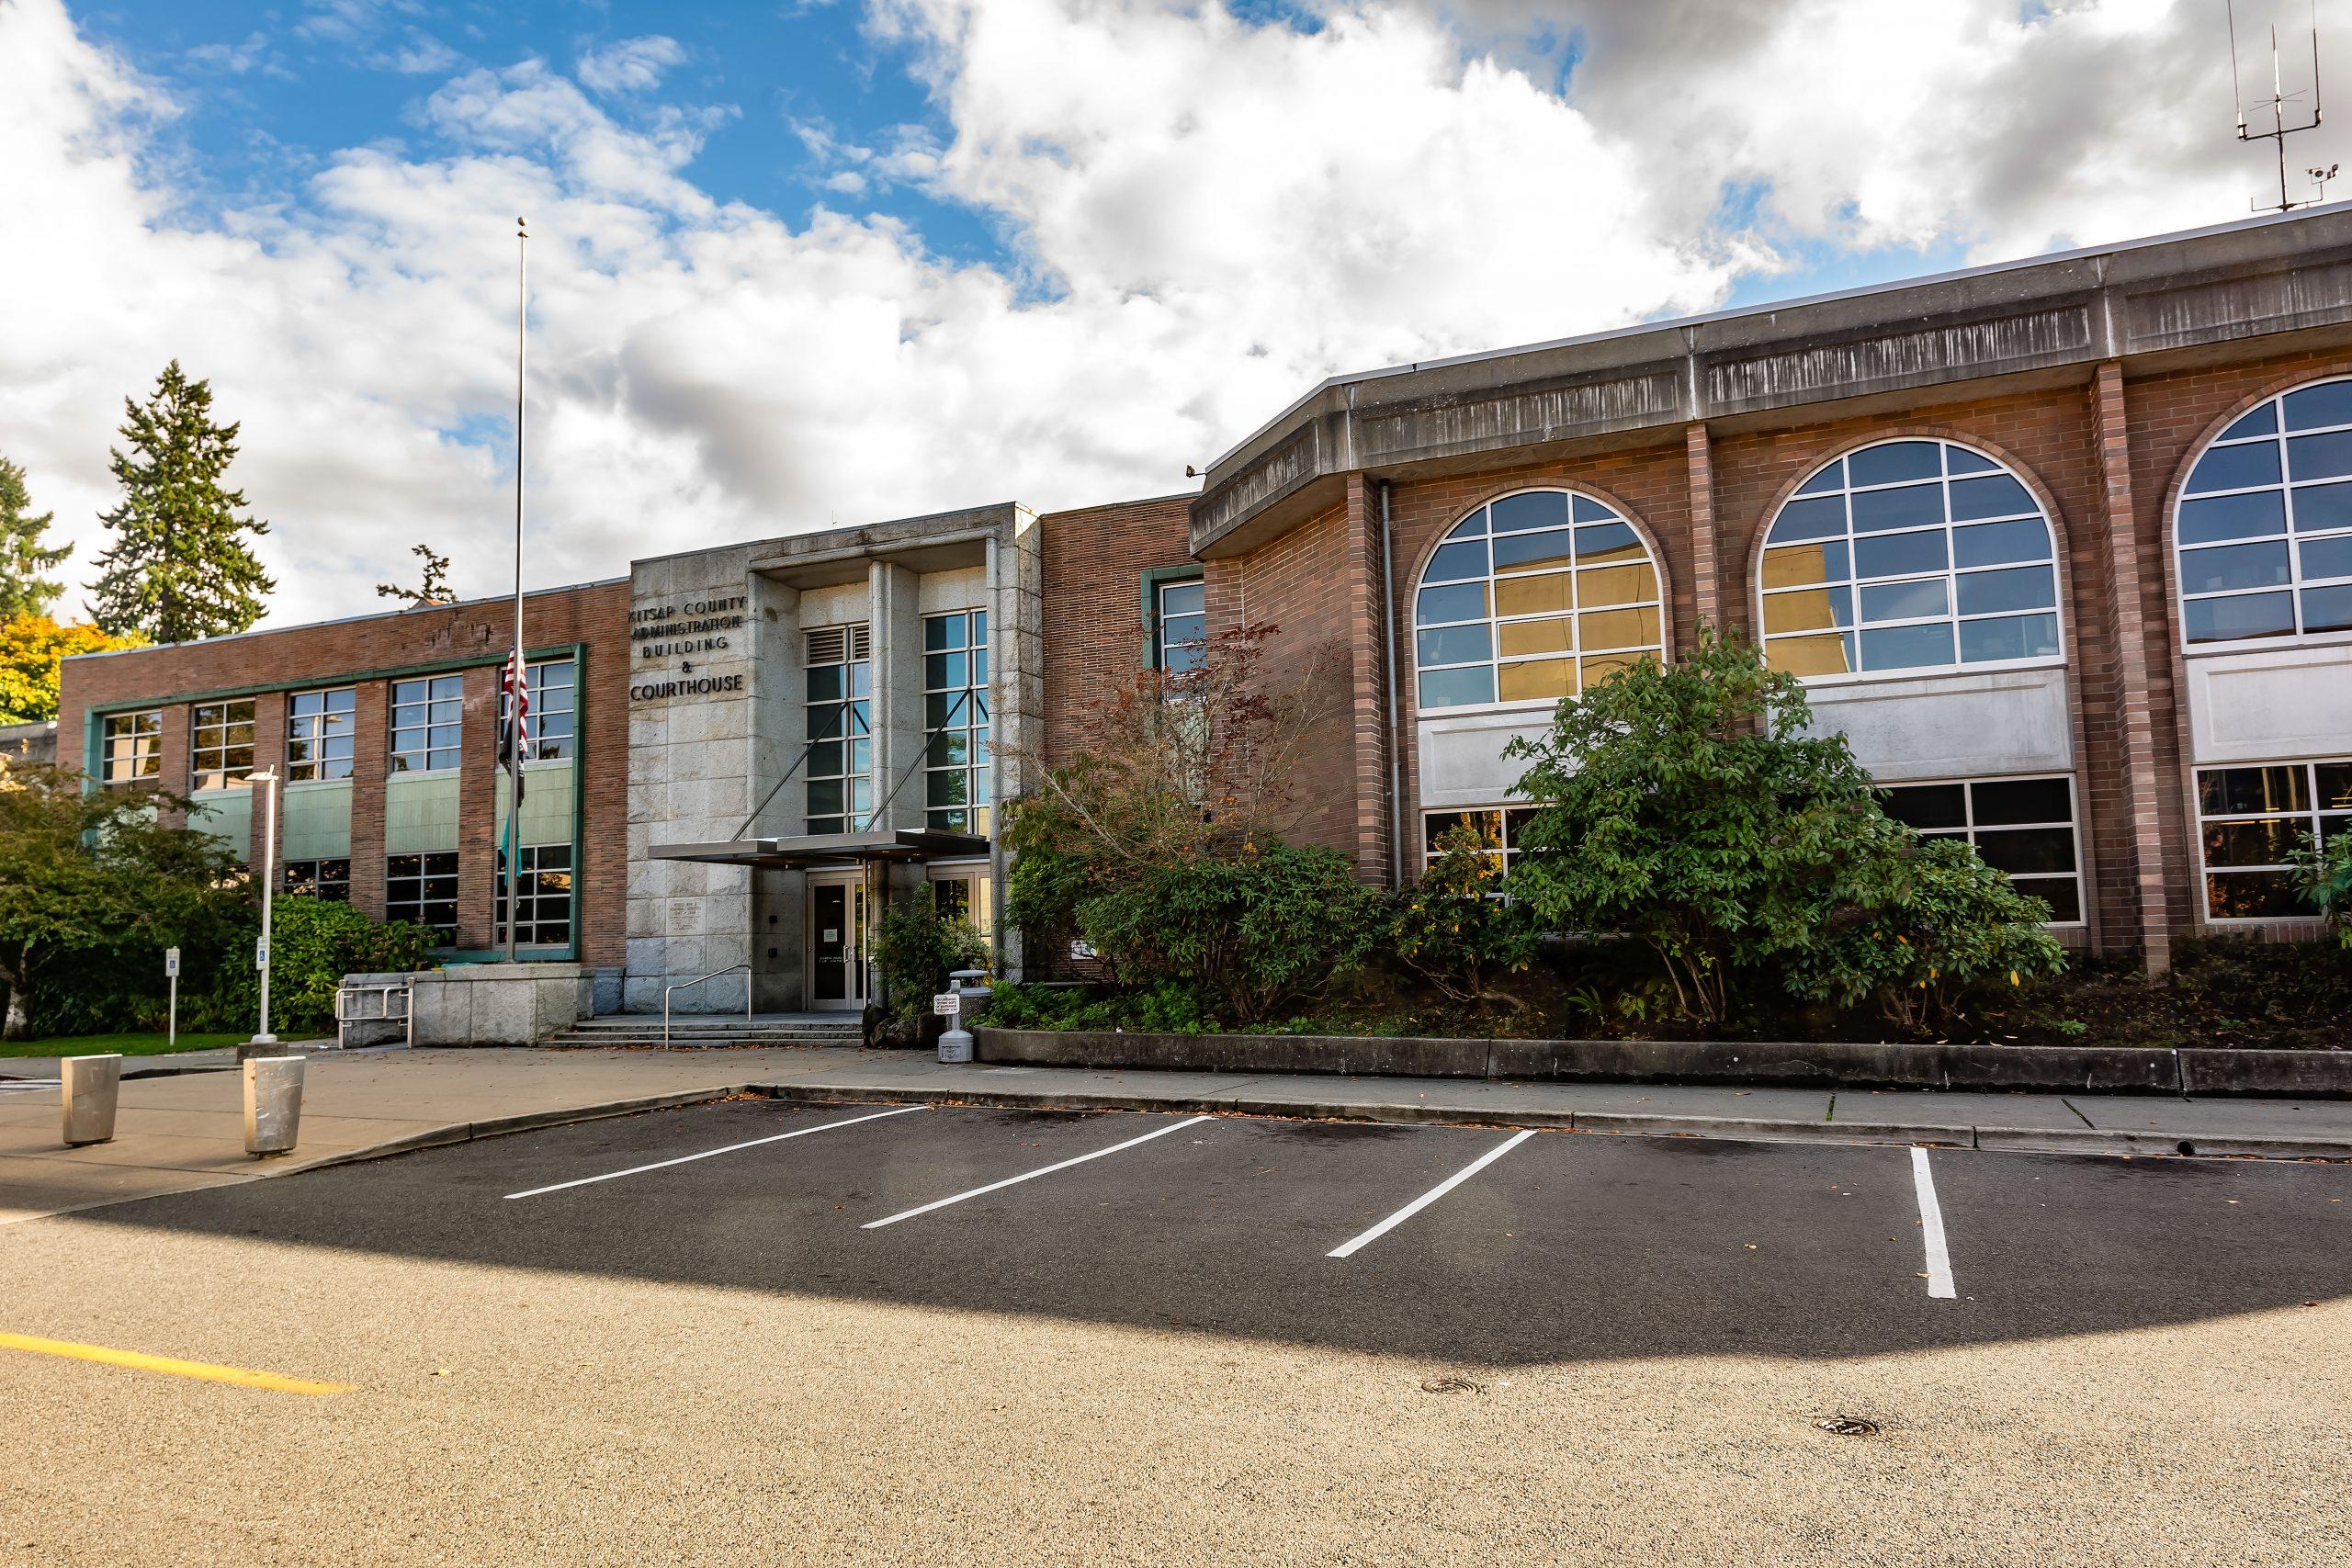 The Kitsap County Washington Court House